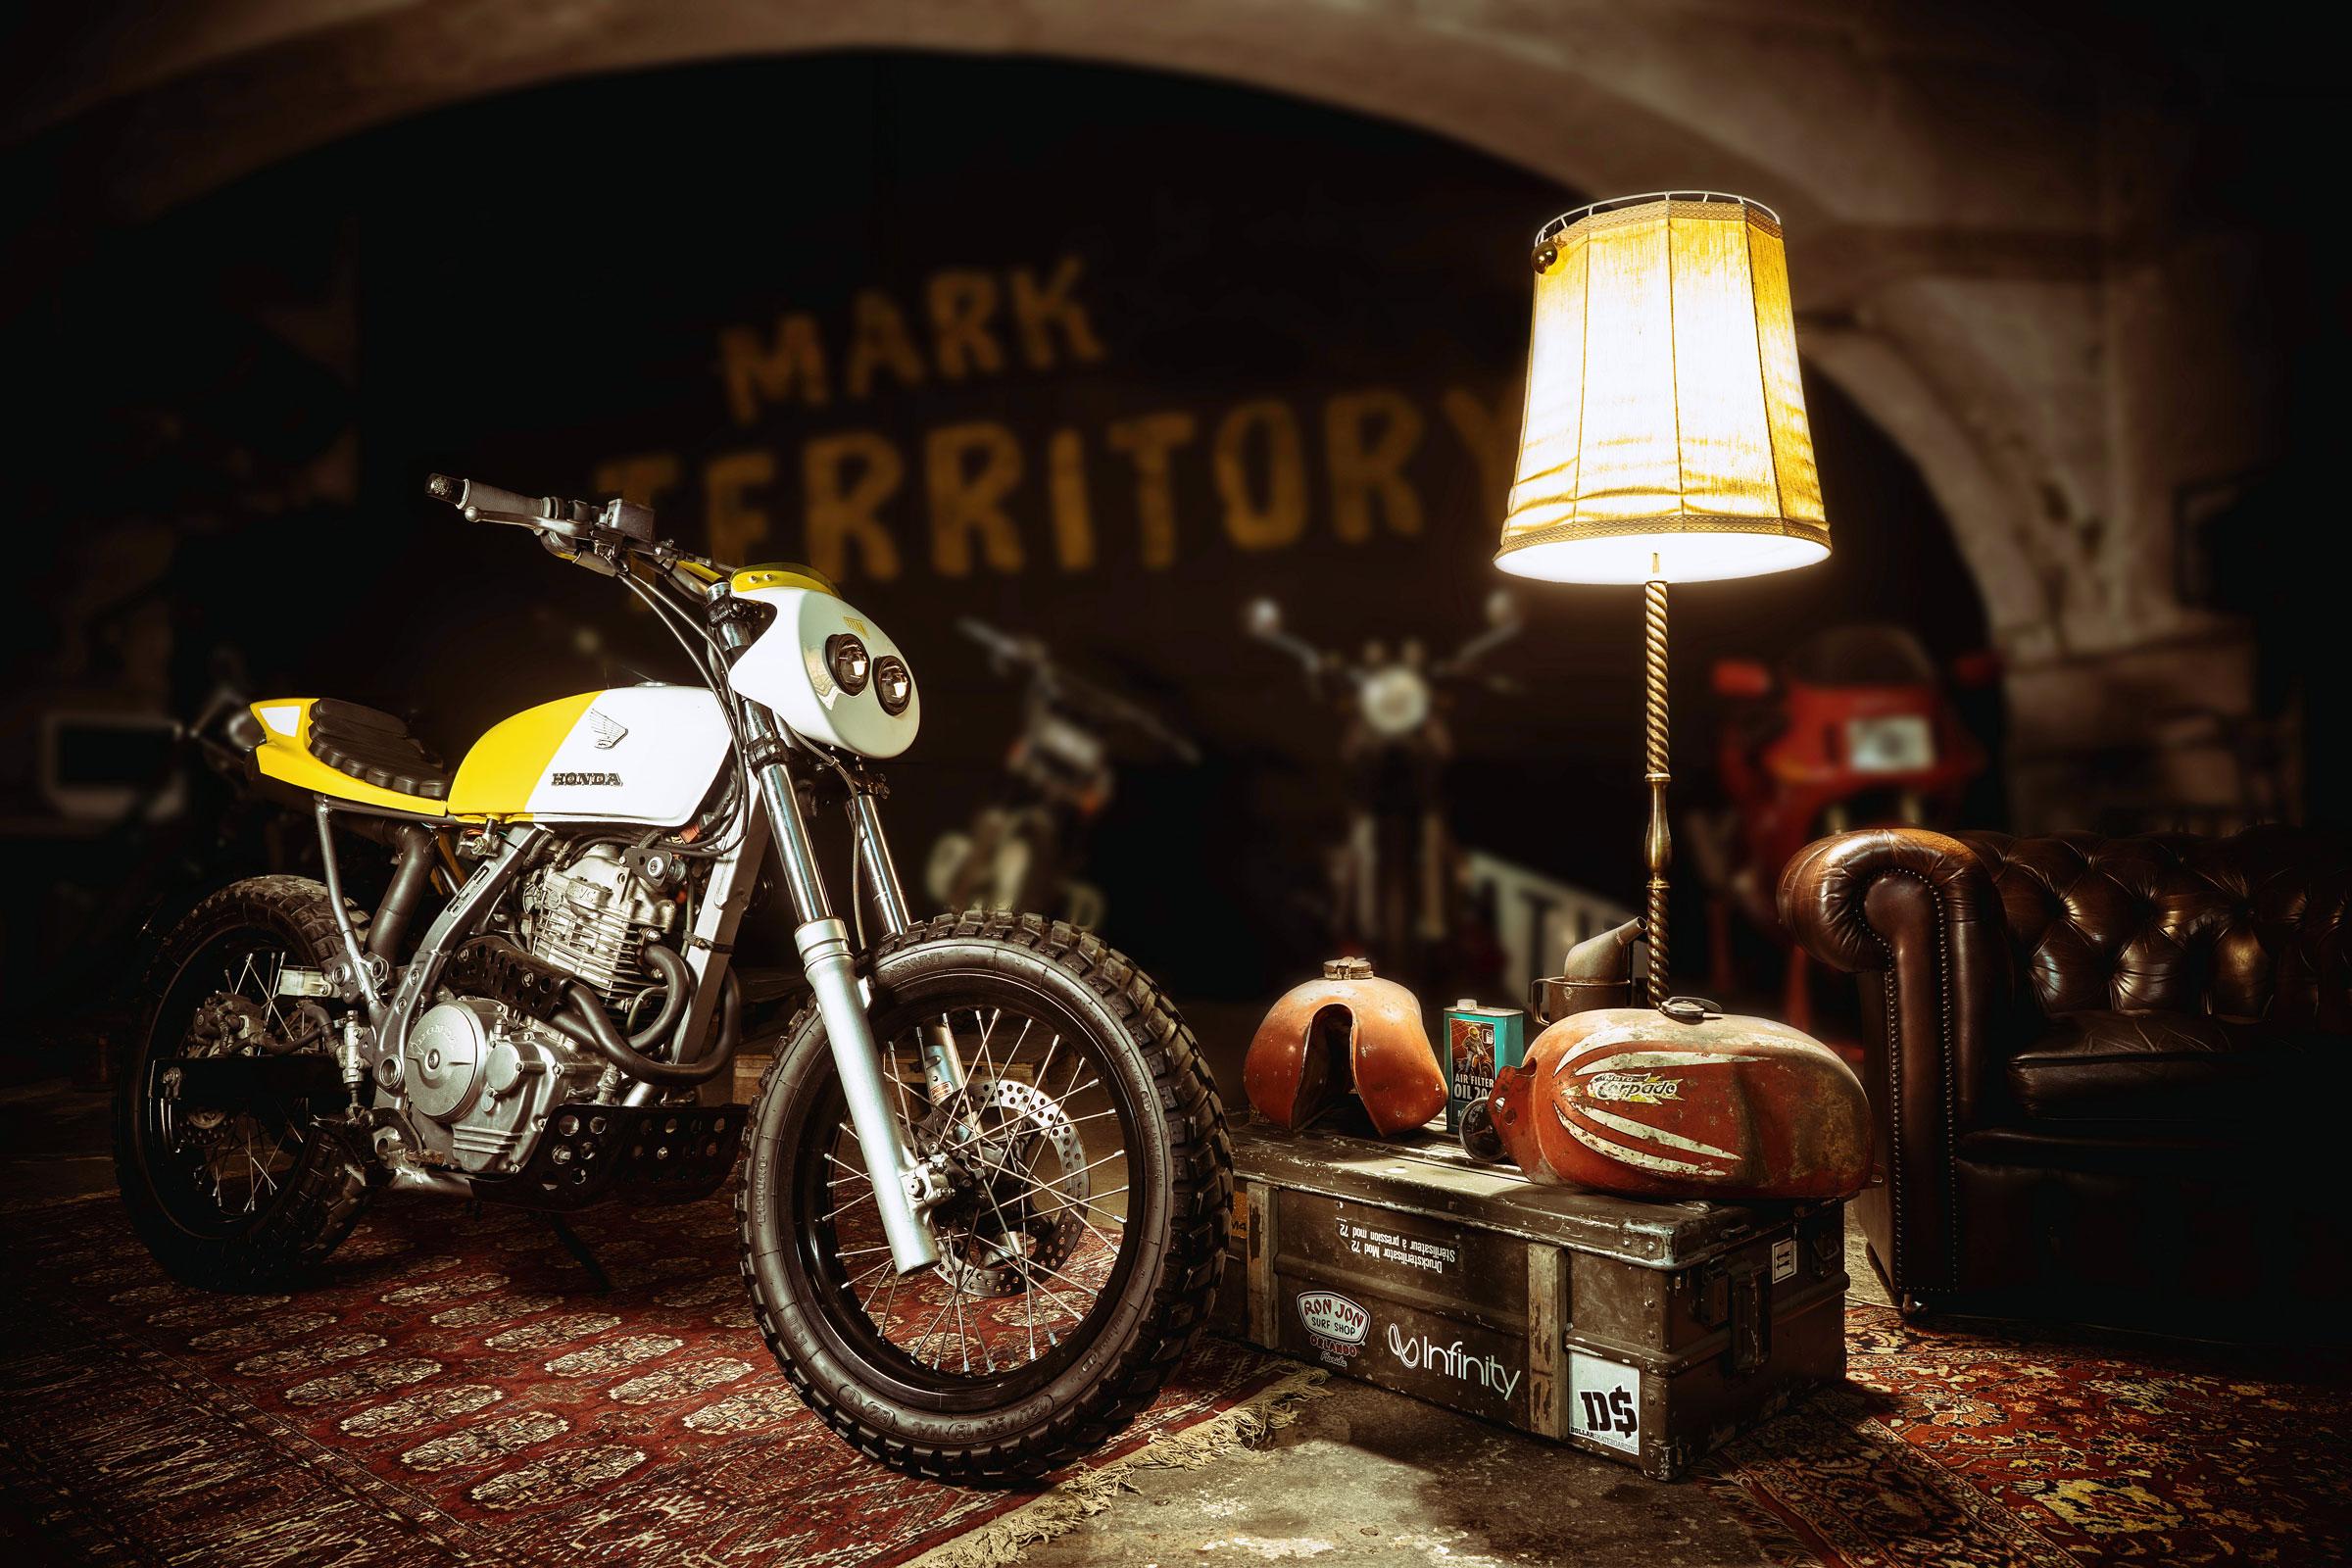 05_TITAN-Domina-Honda-Dominator-Umbau-Cafe-Racer-Graz-Motorrad-Umbau-Austria-Vintage_Custom-Bikes_Motorrad-Umbauten_Styrian-Design